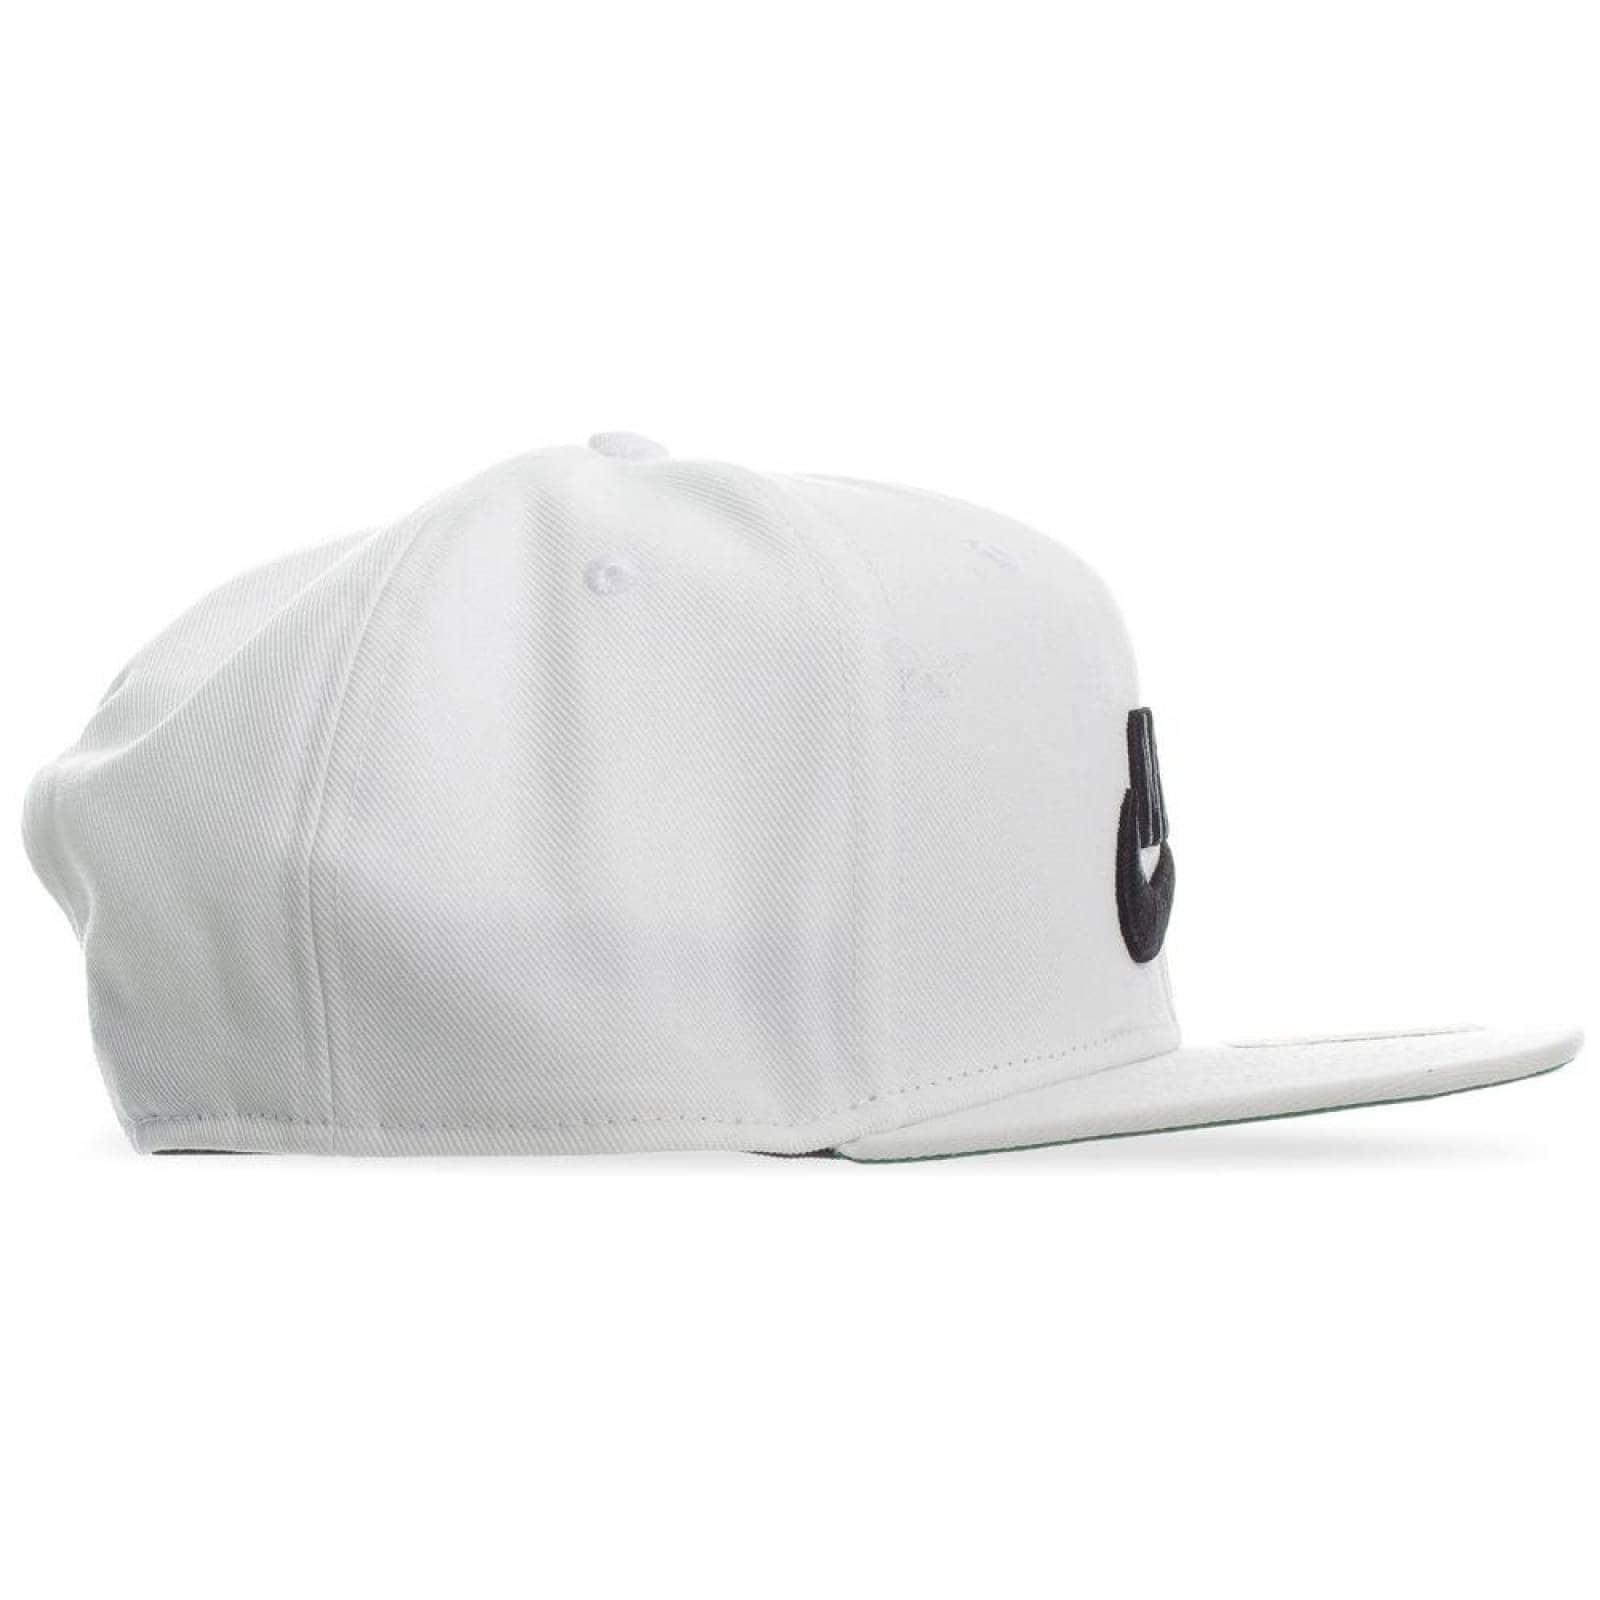 Gorra Nike Pro Futura 891284100 Blanco Unisex